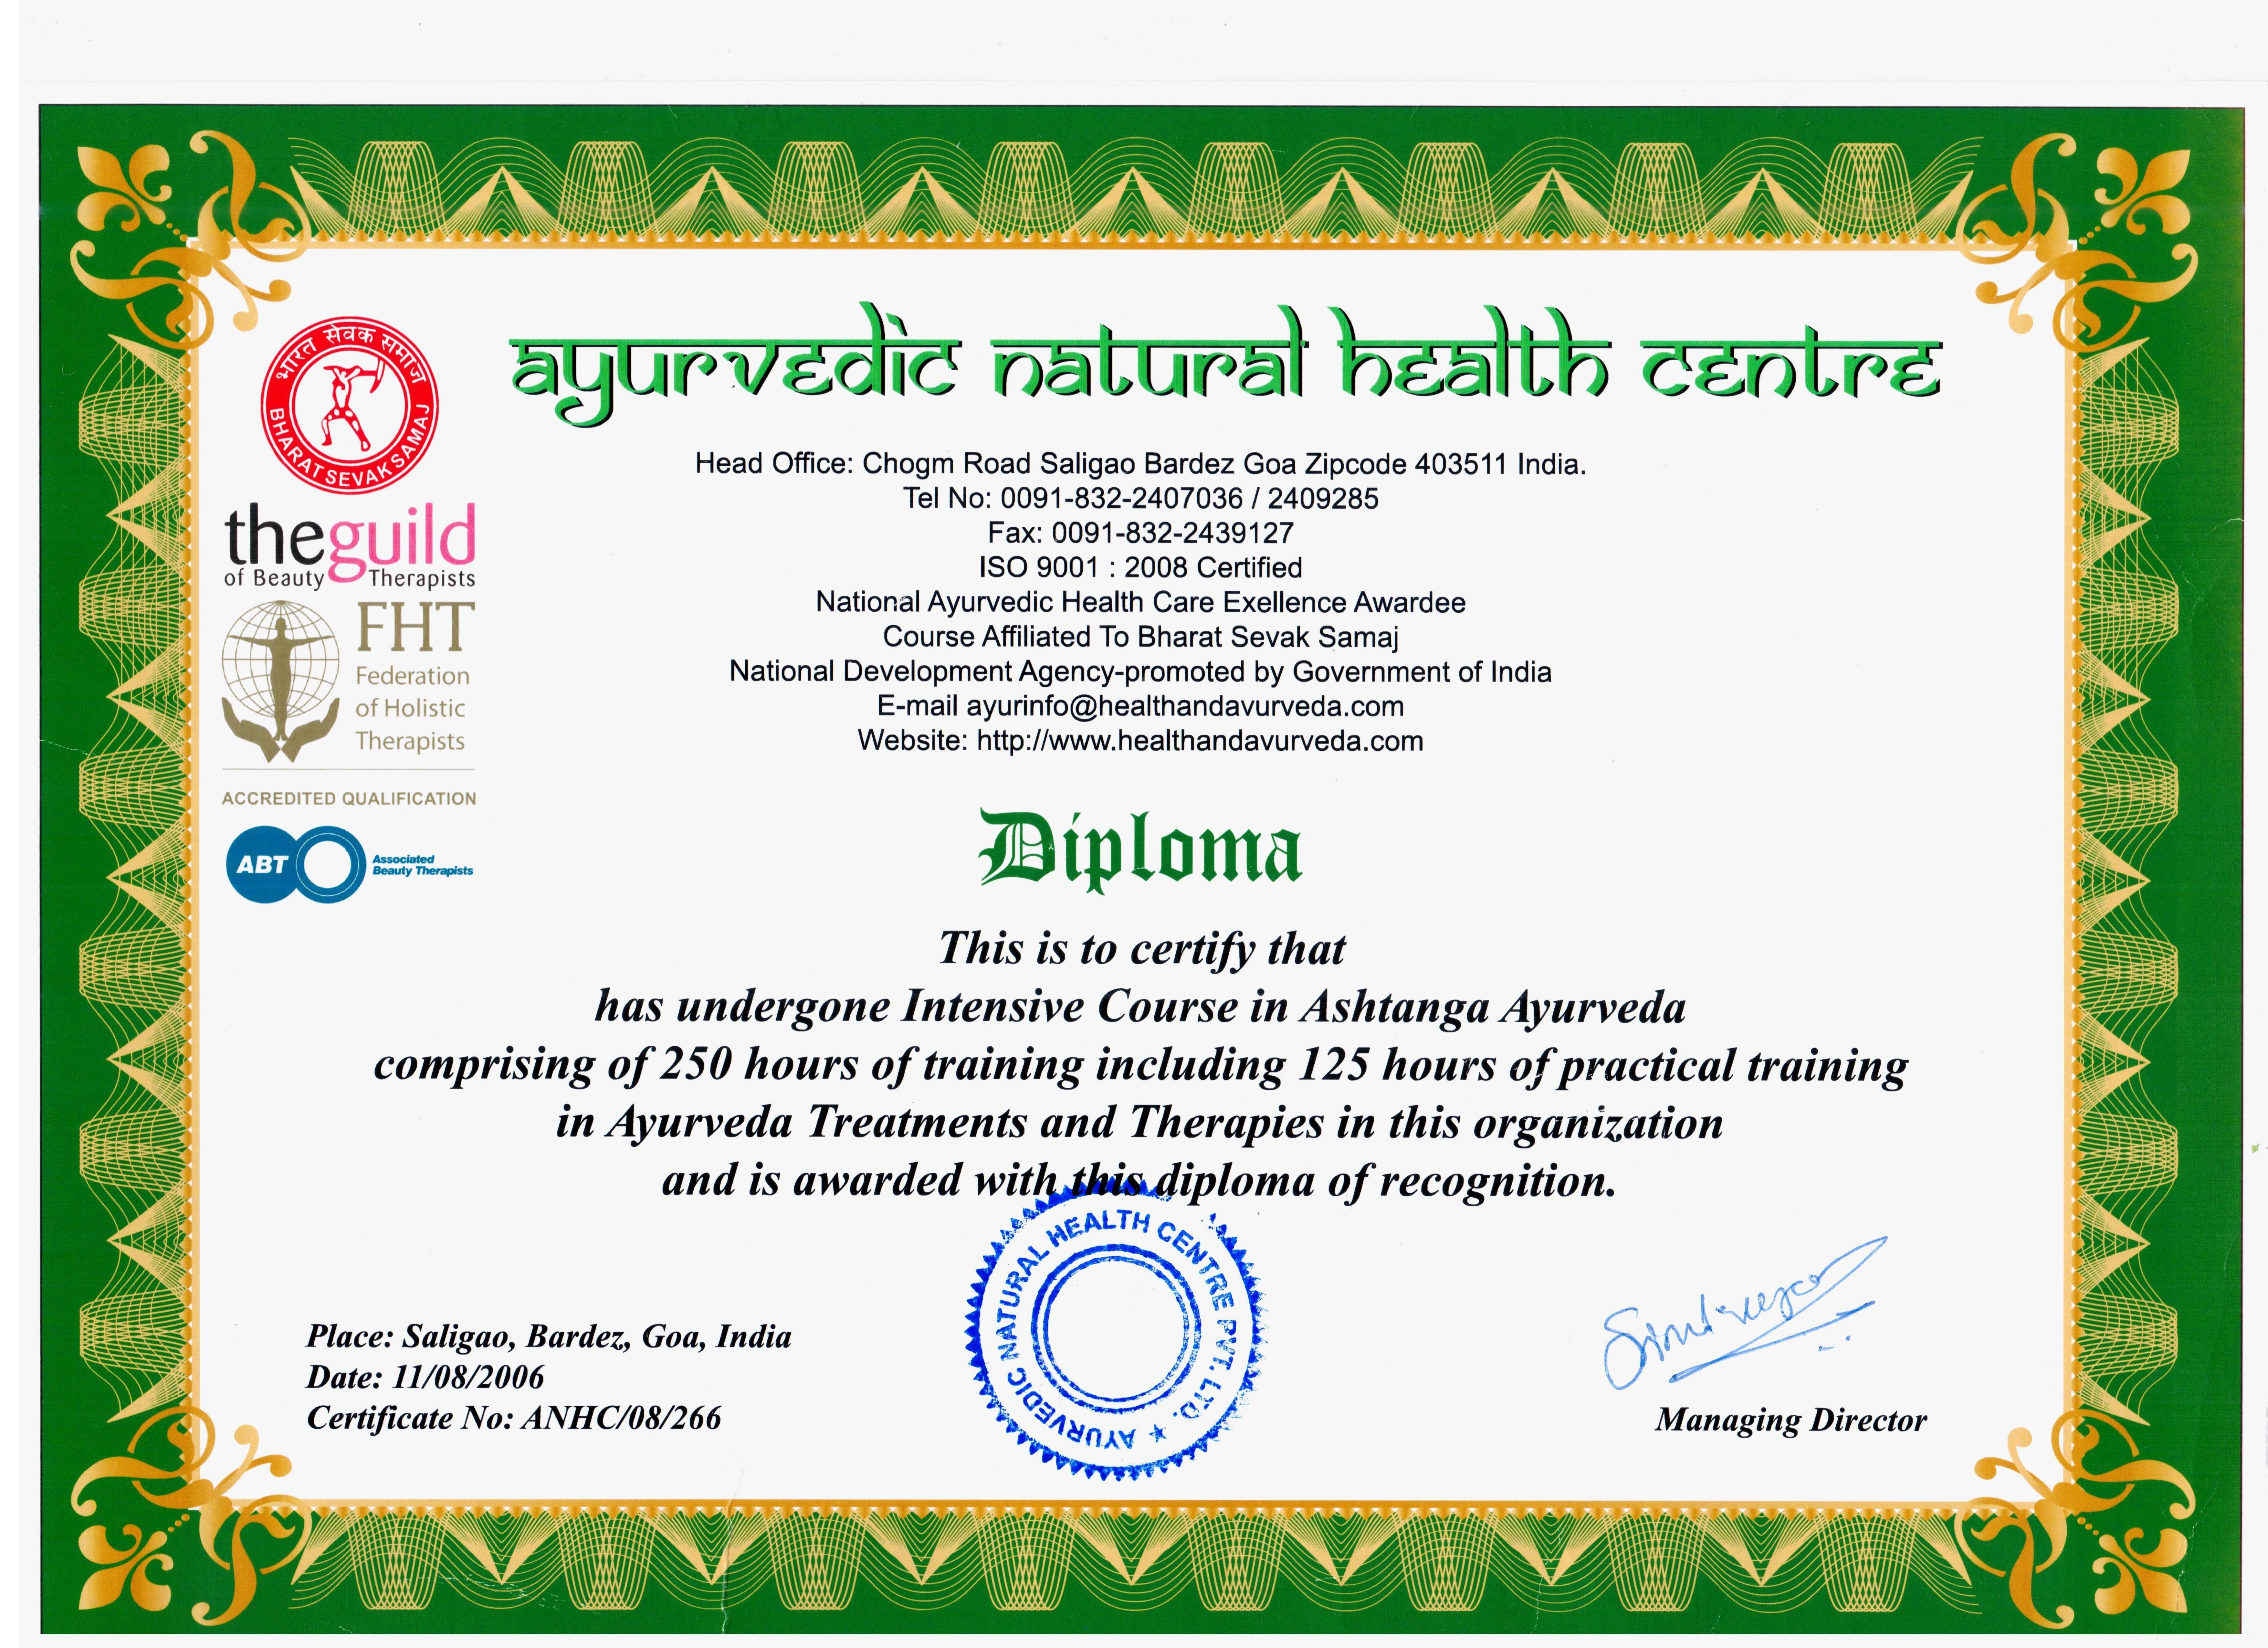 Диплом Ayurveda Natural Health Centre